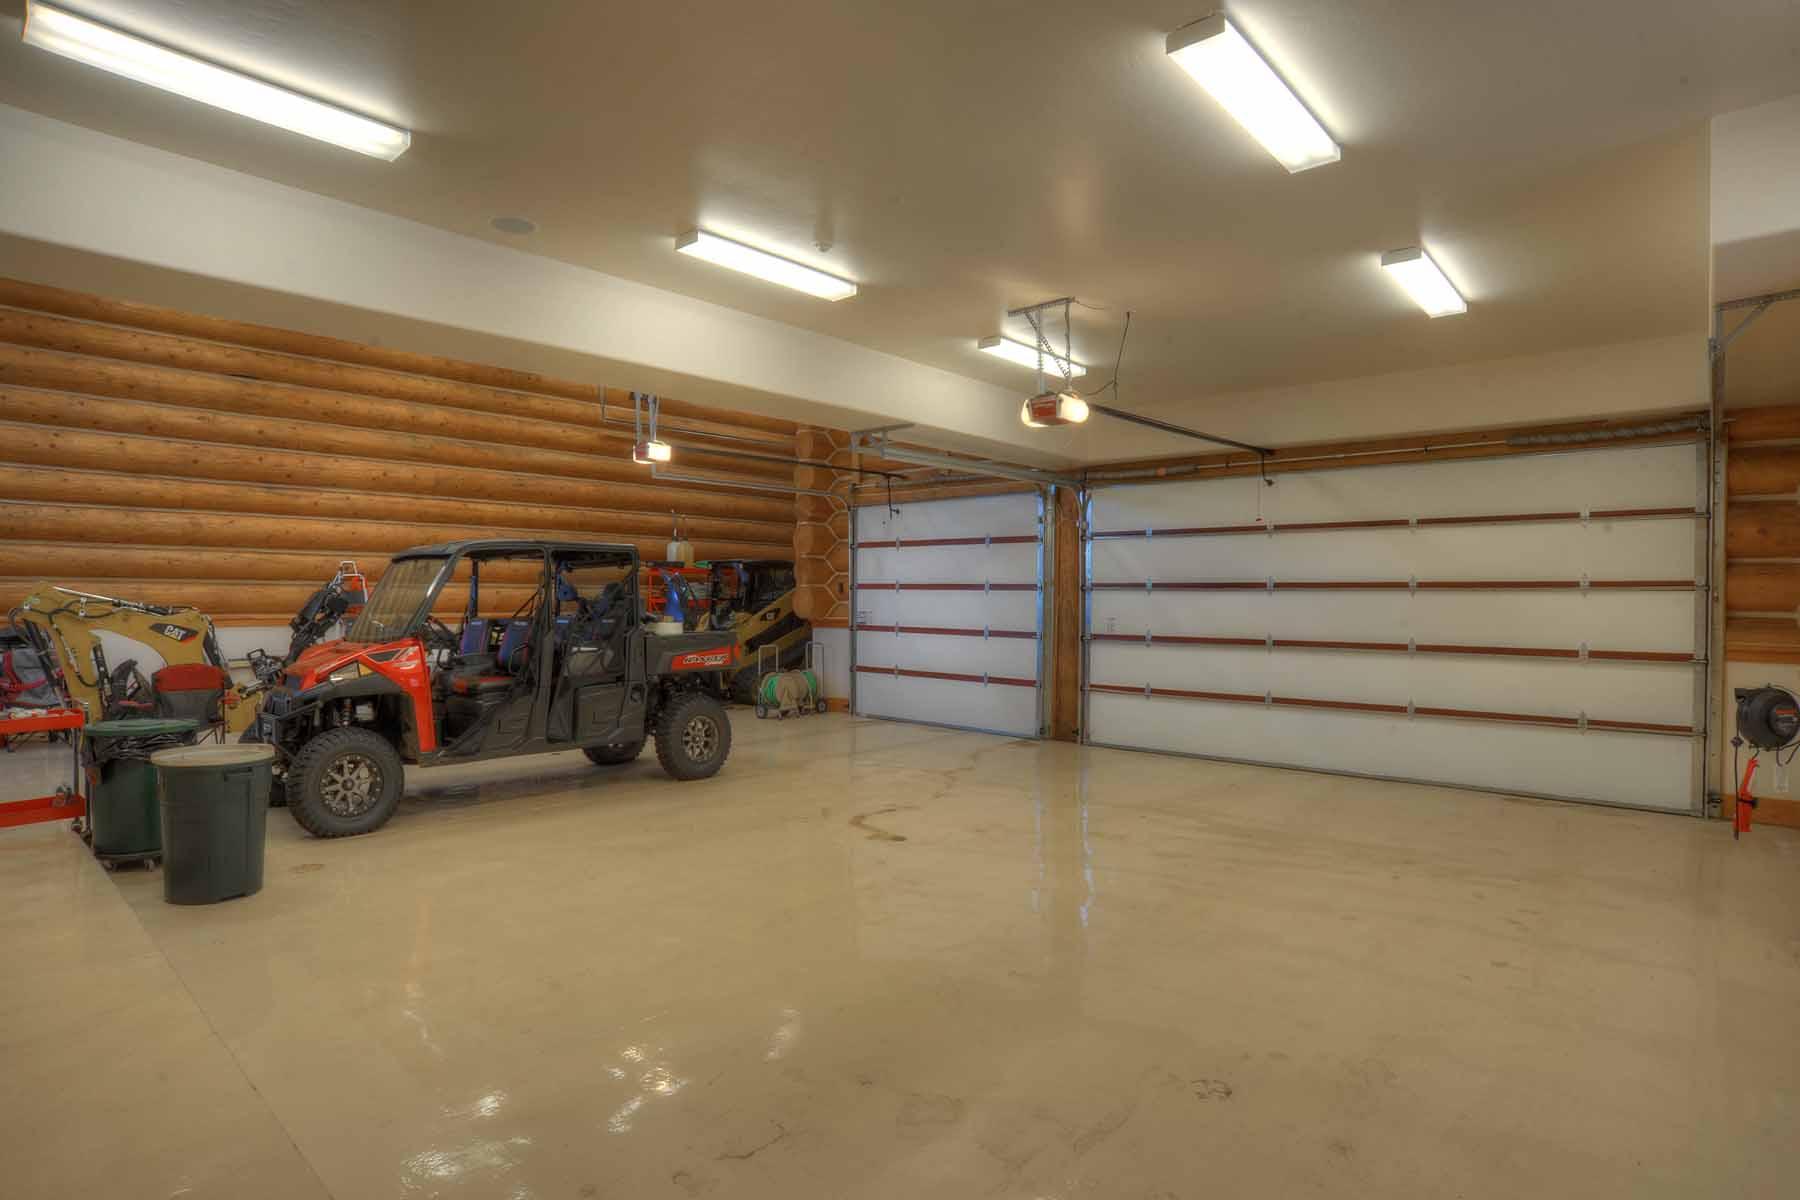 Additional photo for property listing at 421 S Windom Way 421 S Windom Way Durango, Colorado 81301 United States